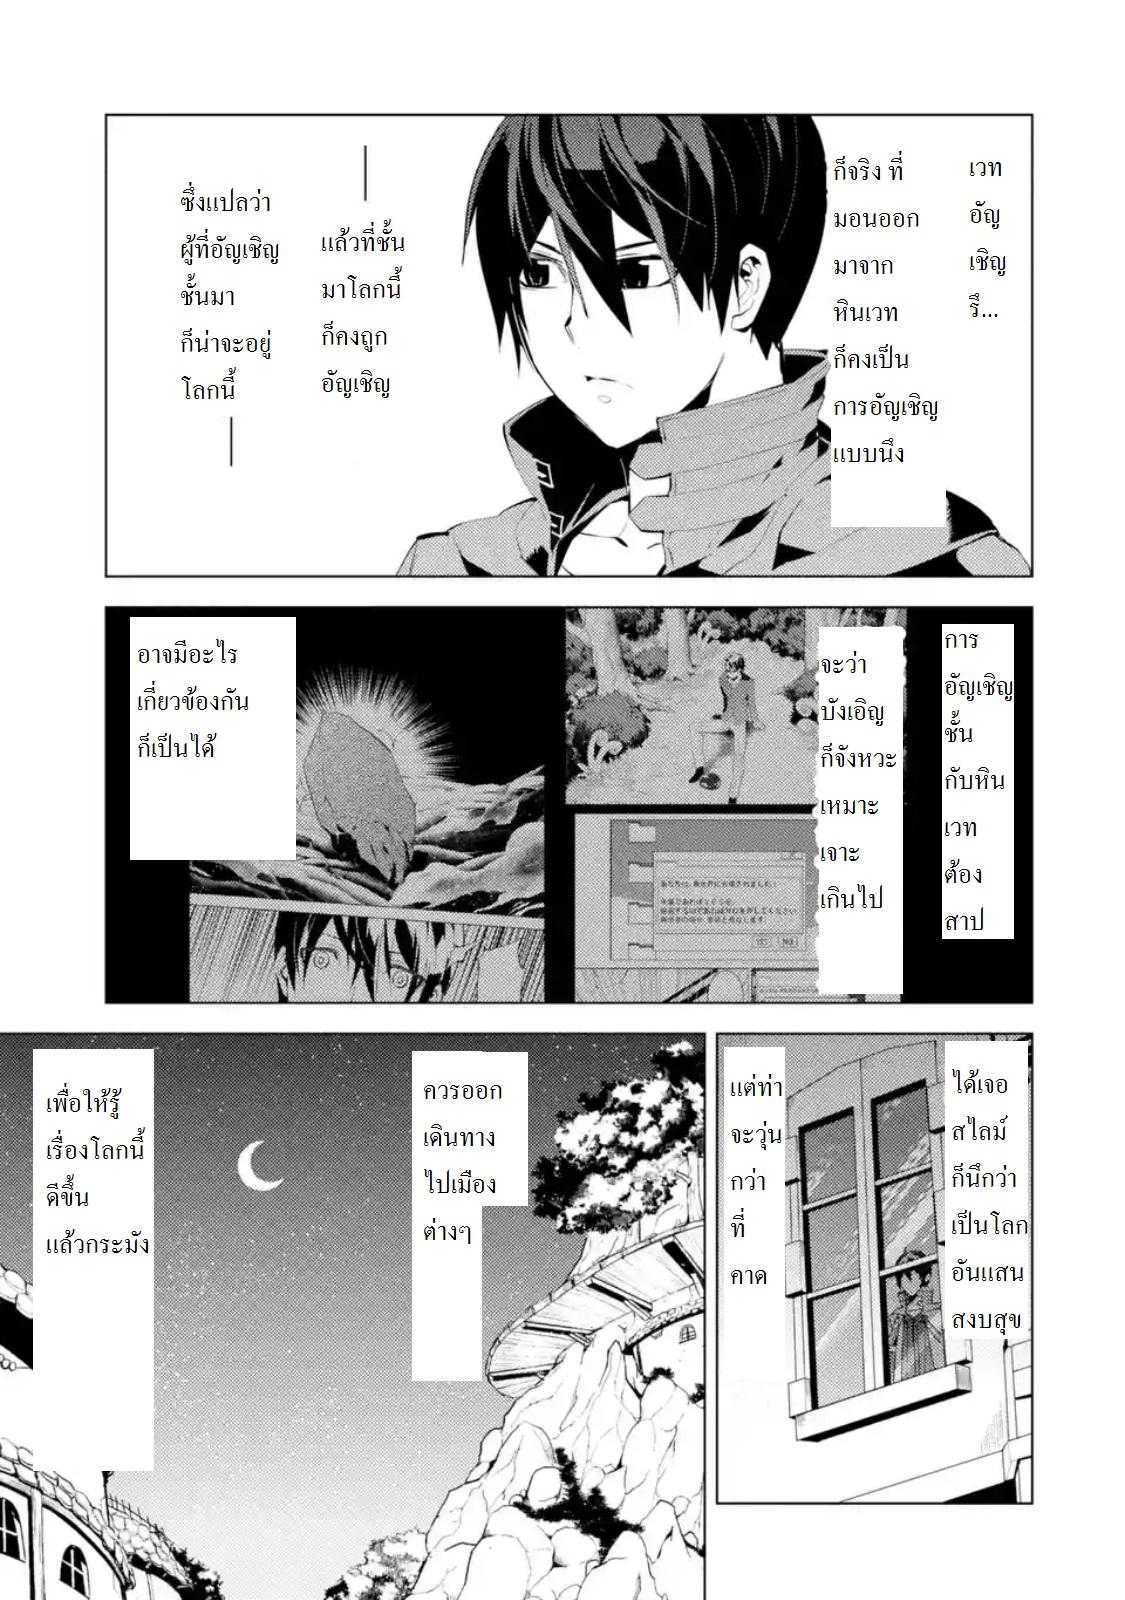 Tensei Kenja no Isekai Life ตอนที่ 7.2 TH แปลไทย